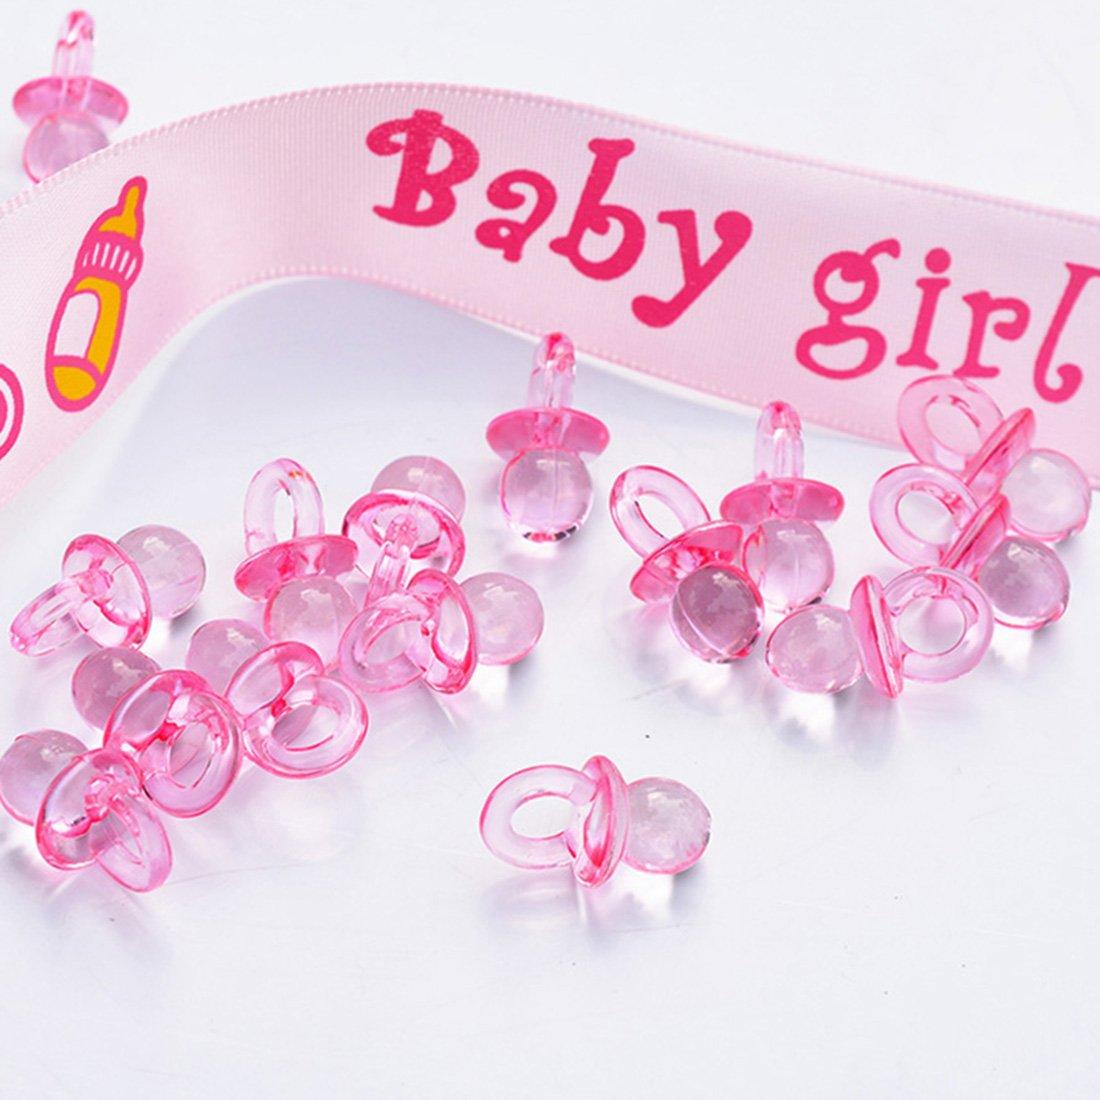 Amazon.com: 144 Pieces Mini Acrylic Baby Pacifiers Baby ...